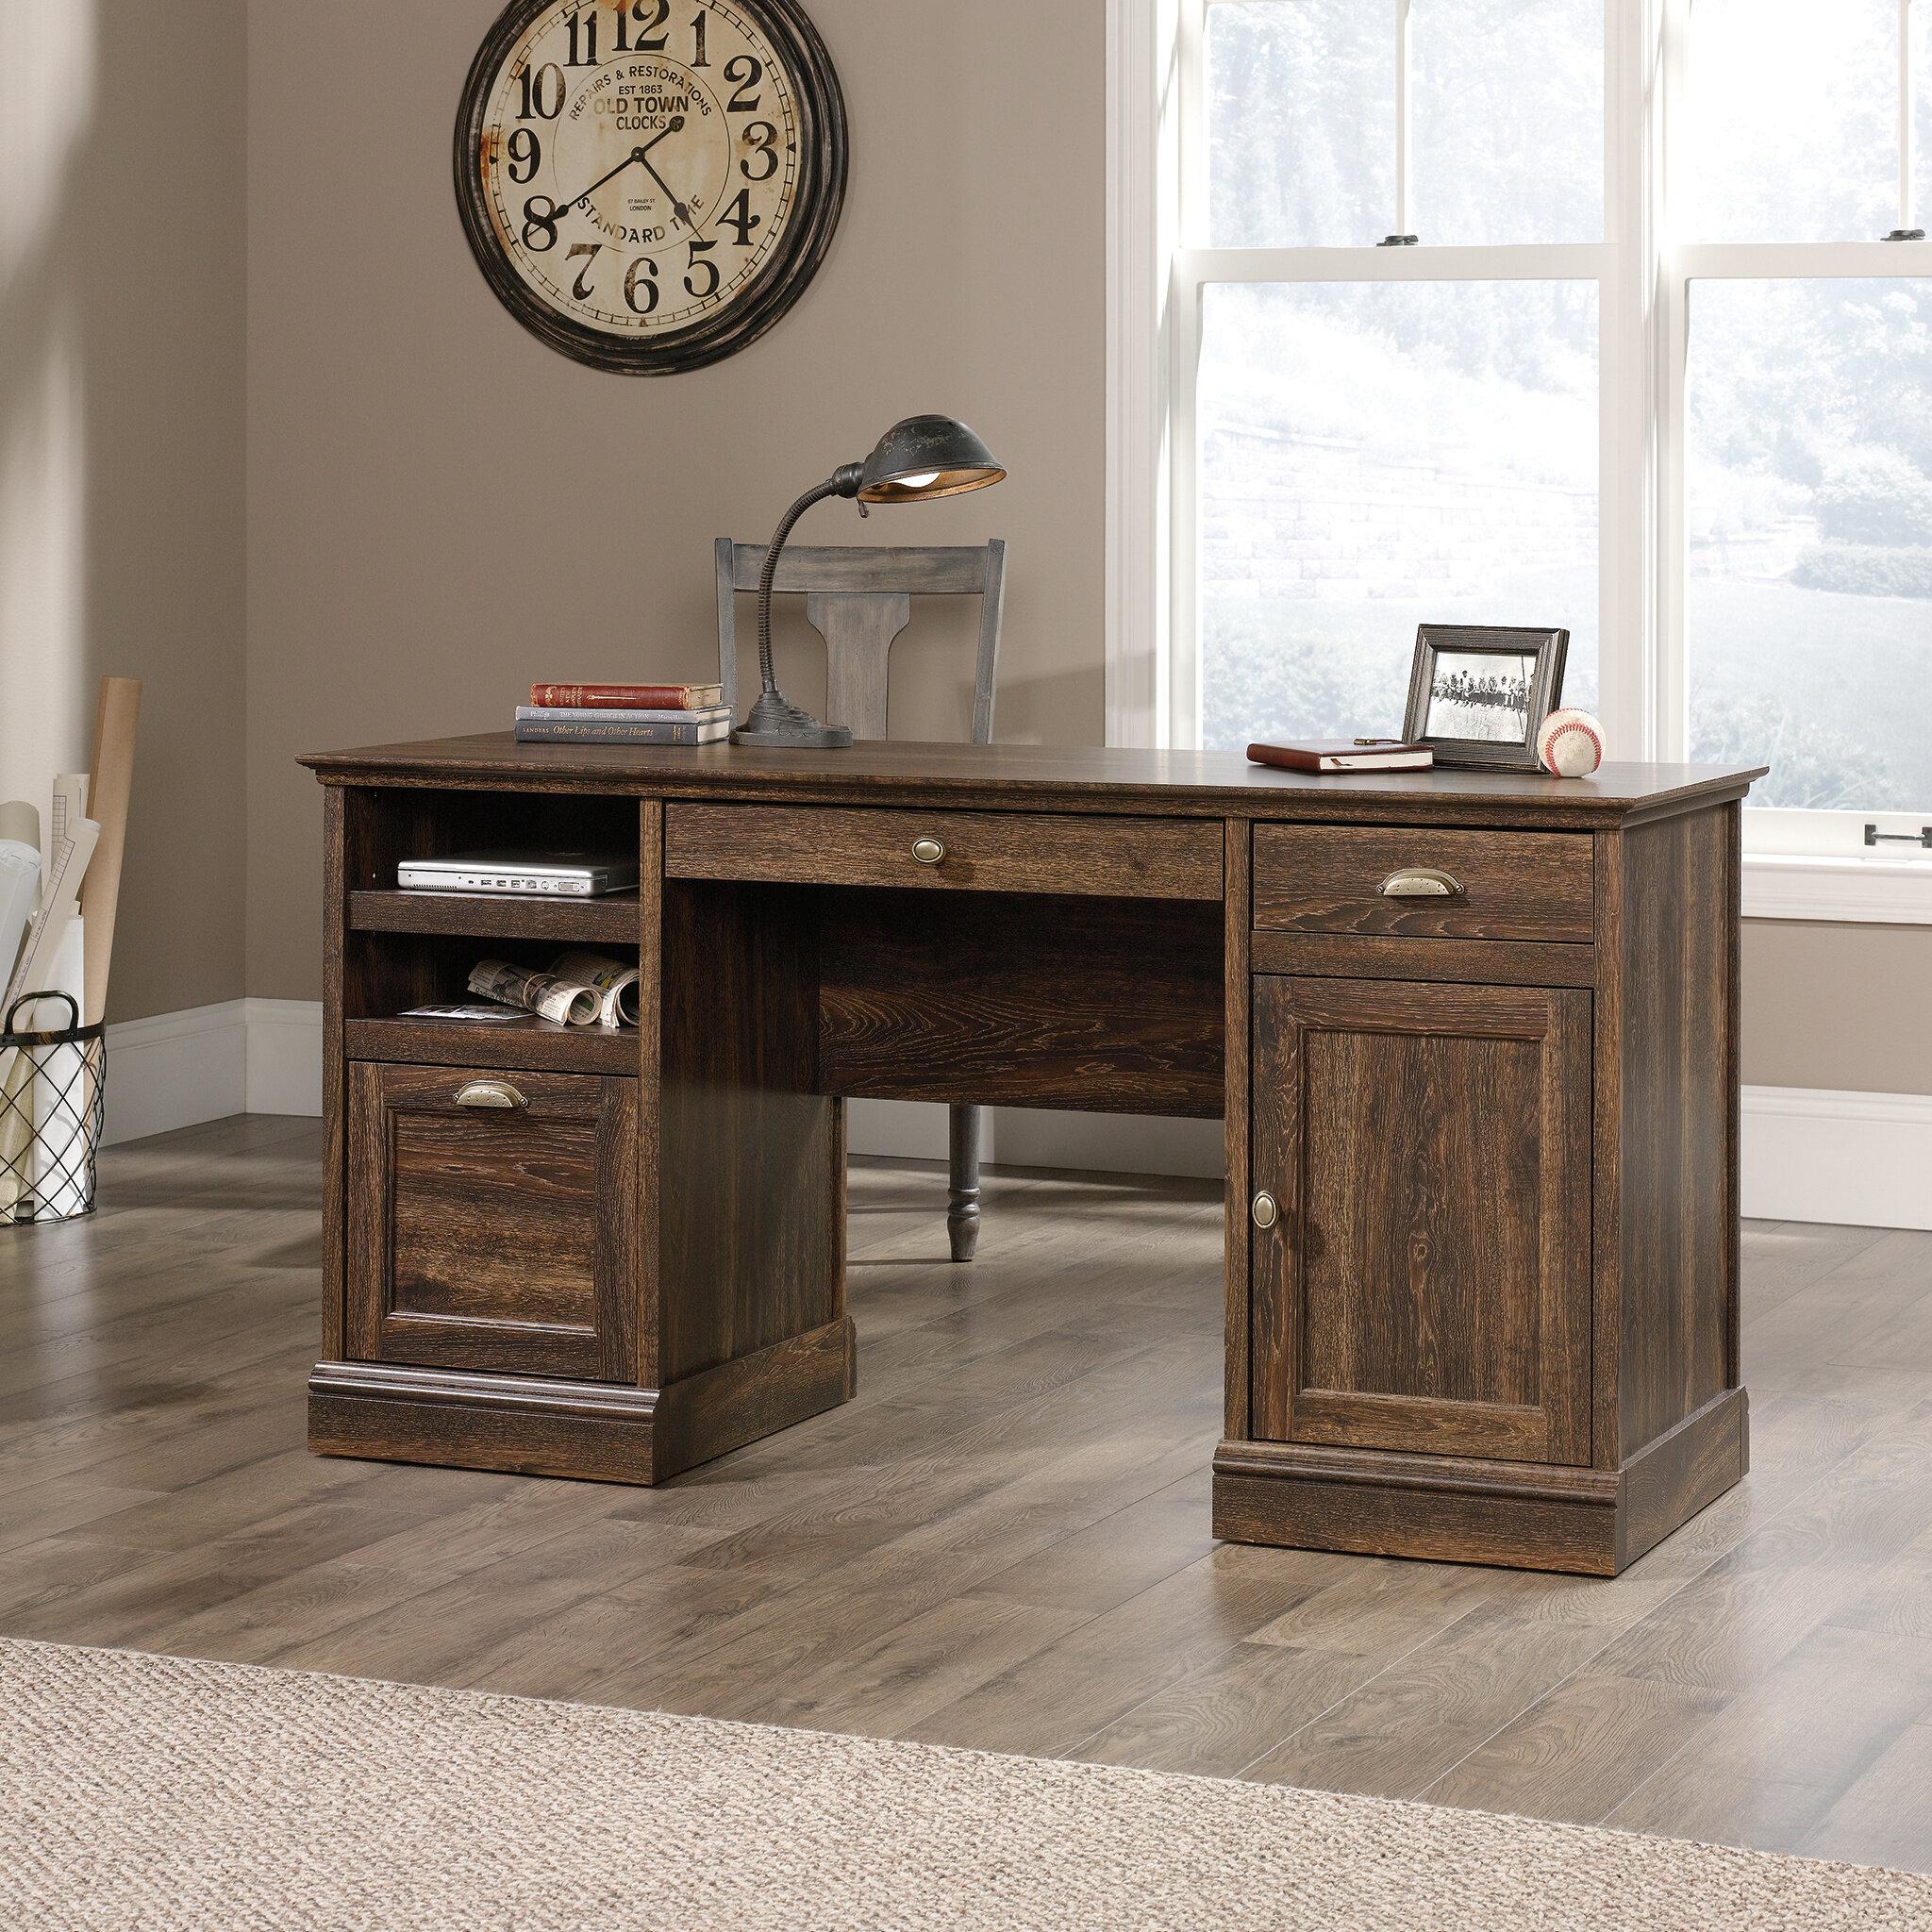 id home saunders sauderusa sauder media furniture facebook